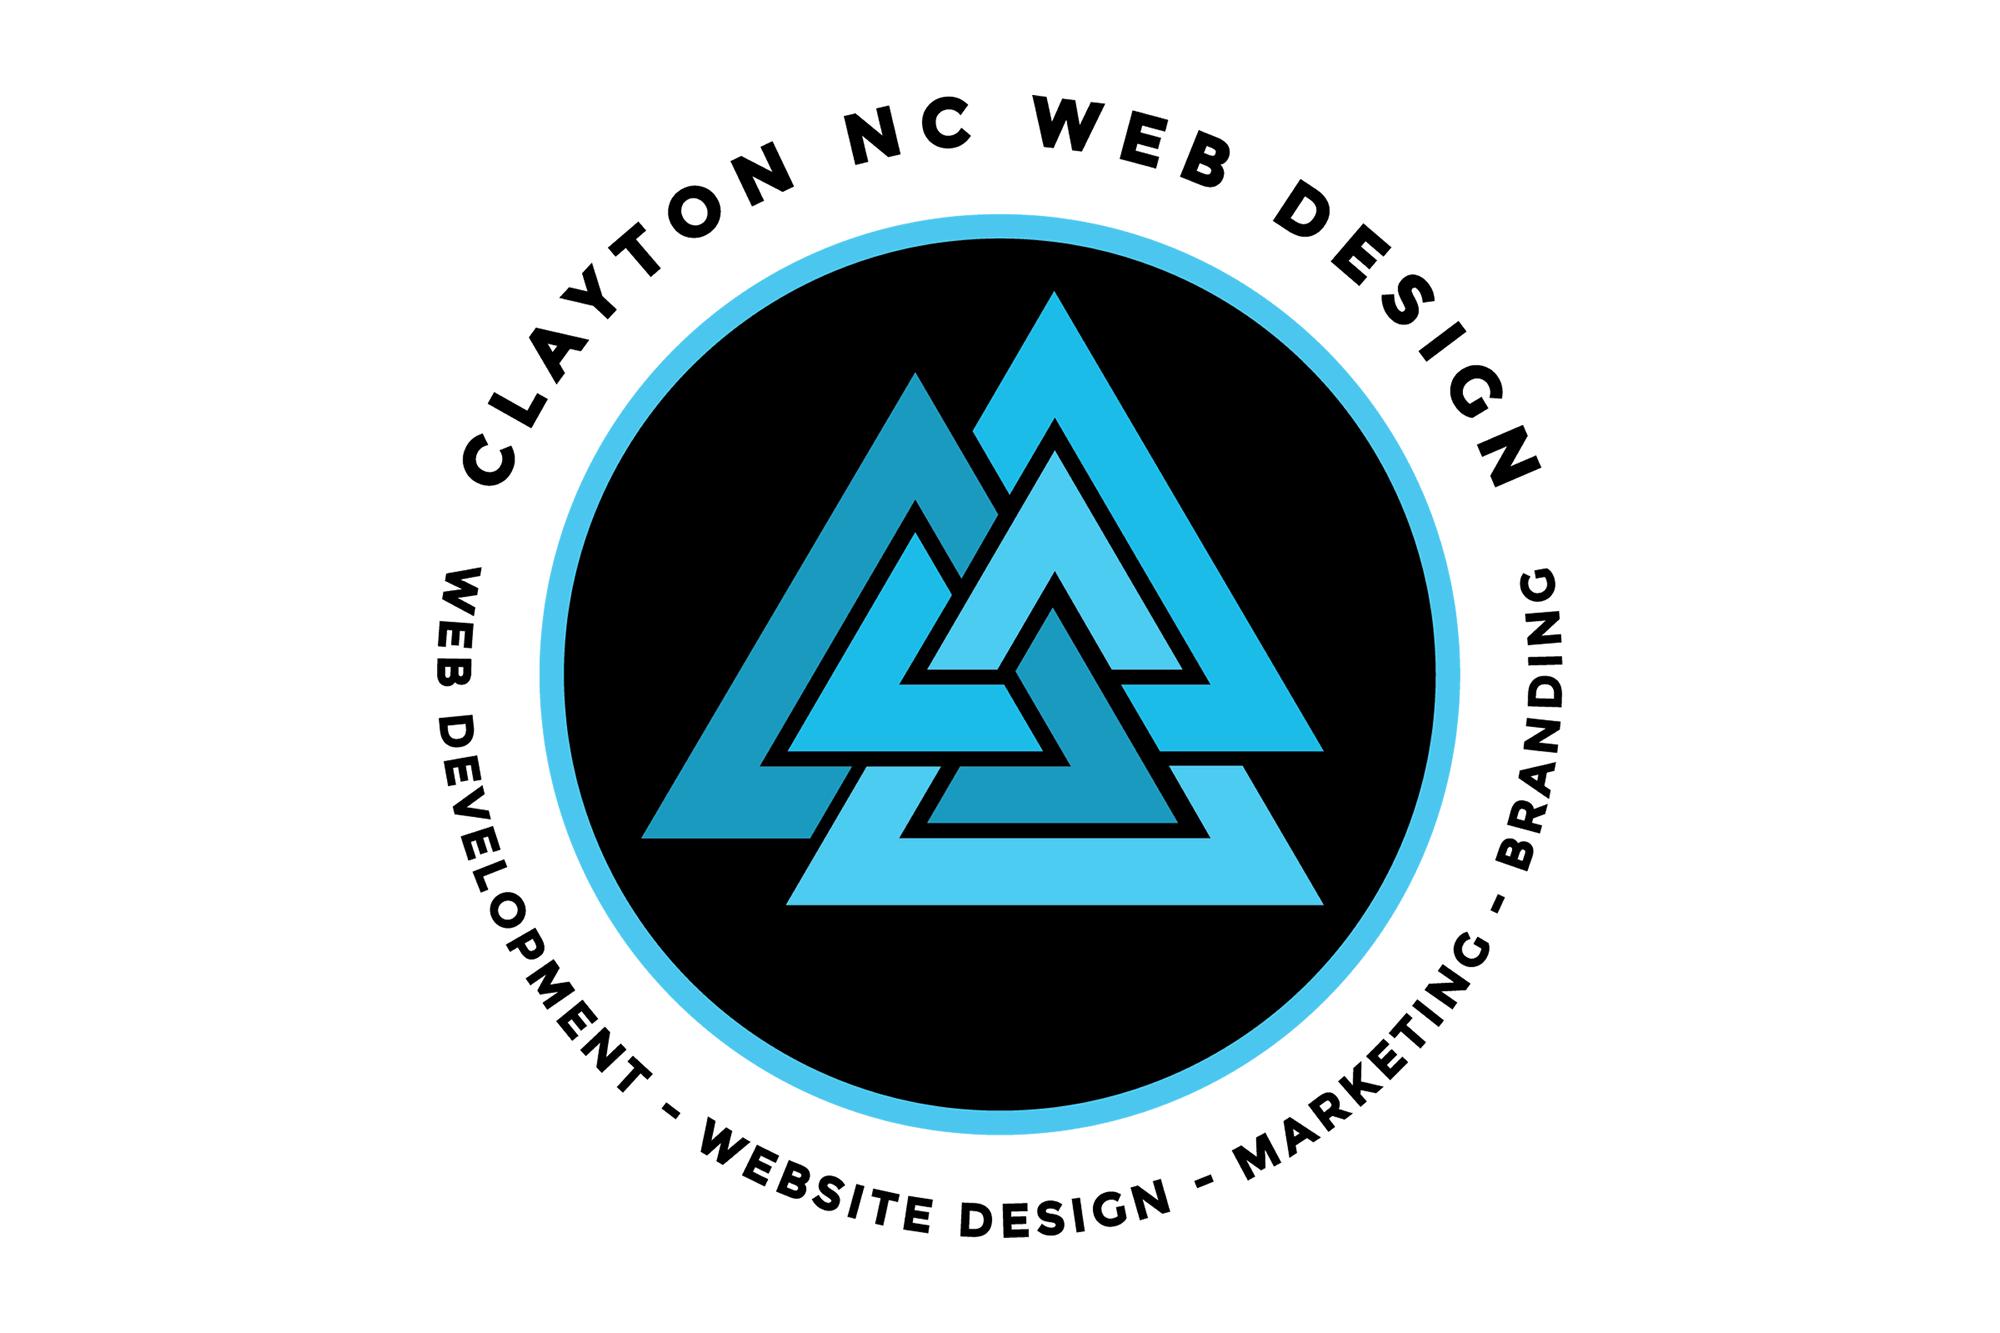 Clayton Nc Web Design Ecommerce Development Seo Marketing Branding